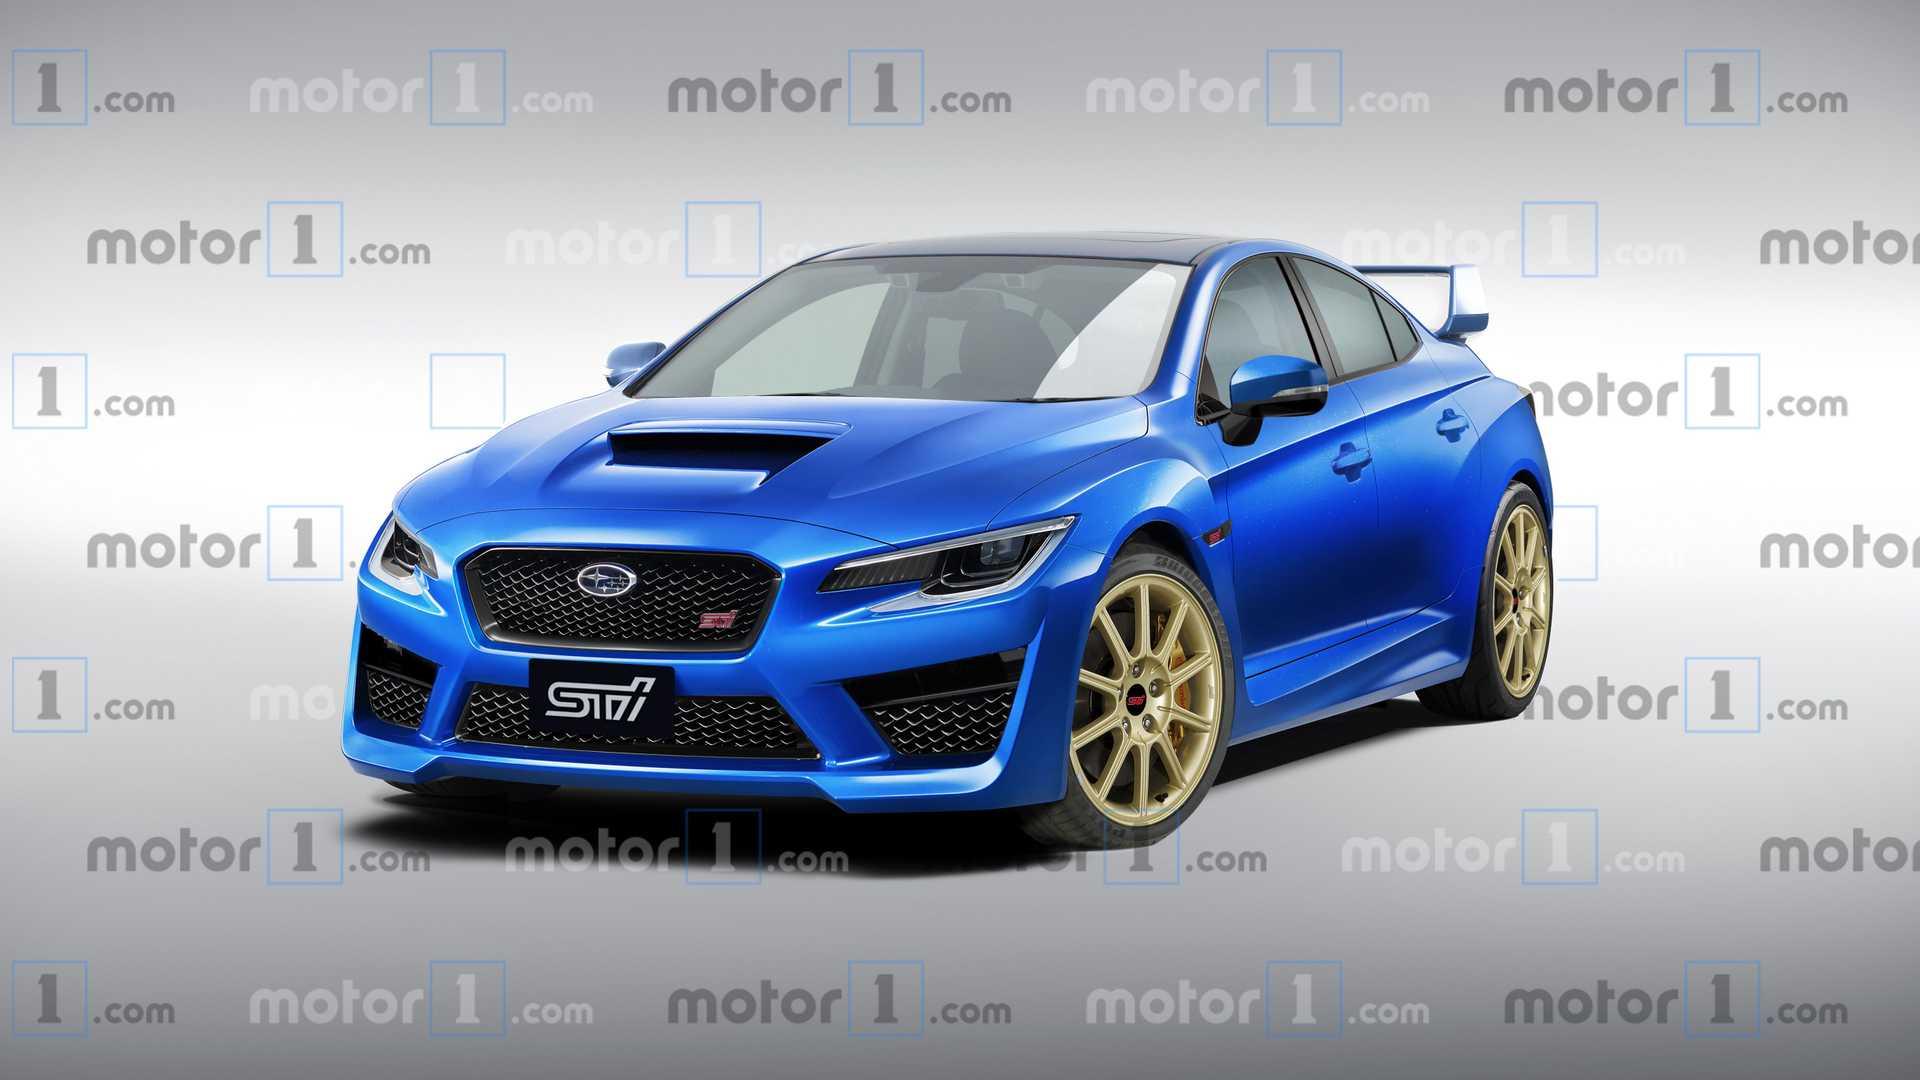 68 Concept of Subaru Sti 2020 Rumors Performance and New Engine for Subaru Sti 2020 Rumors